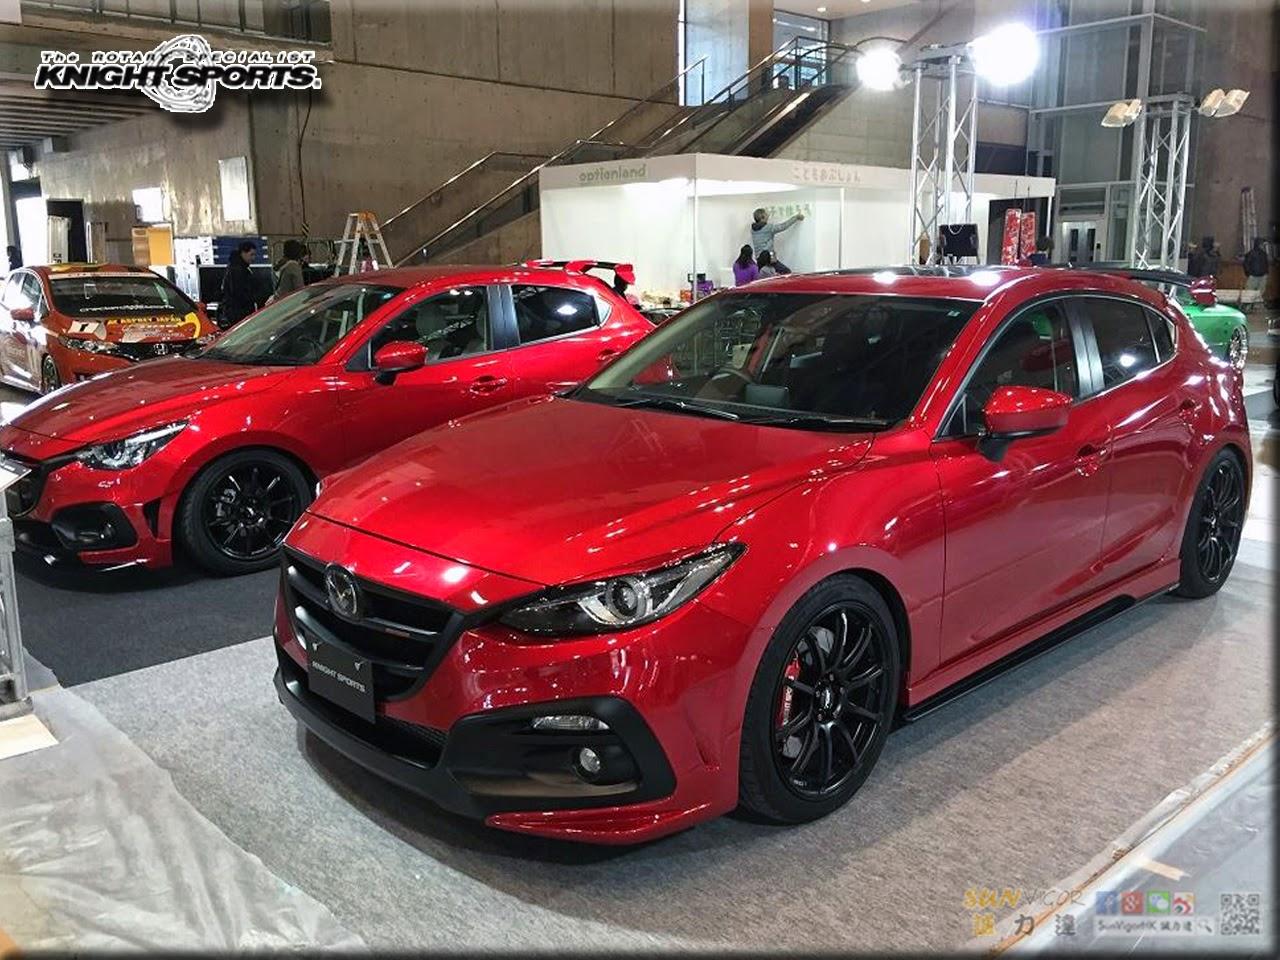 2015 Tokyo Auto Salon Knightsports Knightsports X Mazda Modified